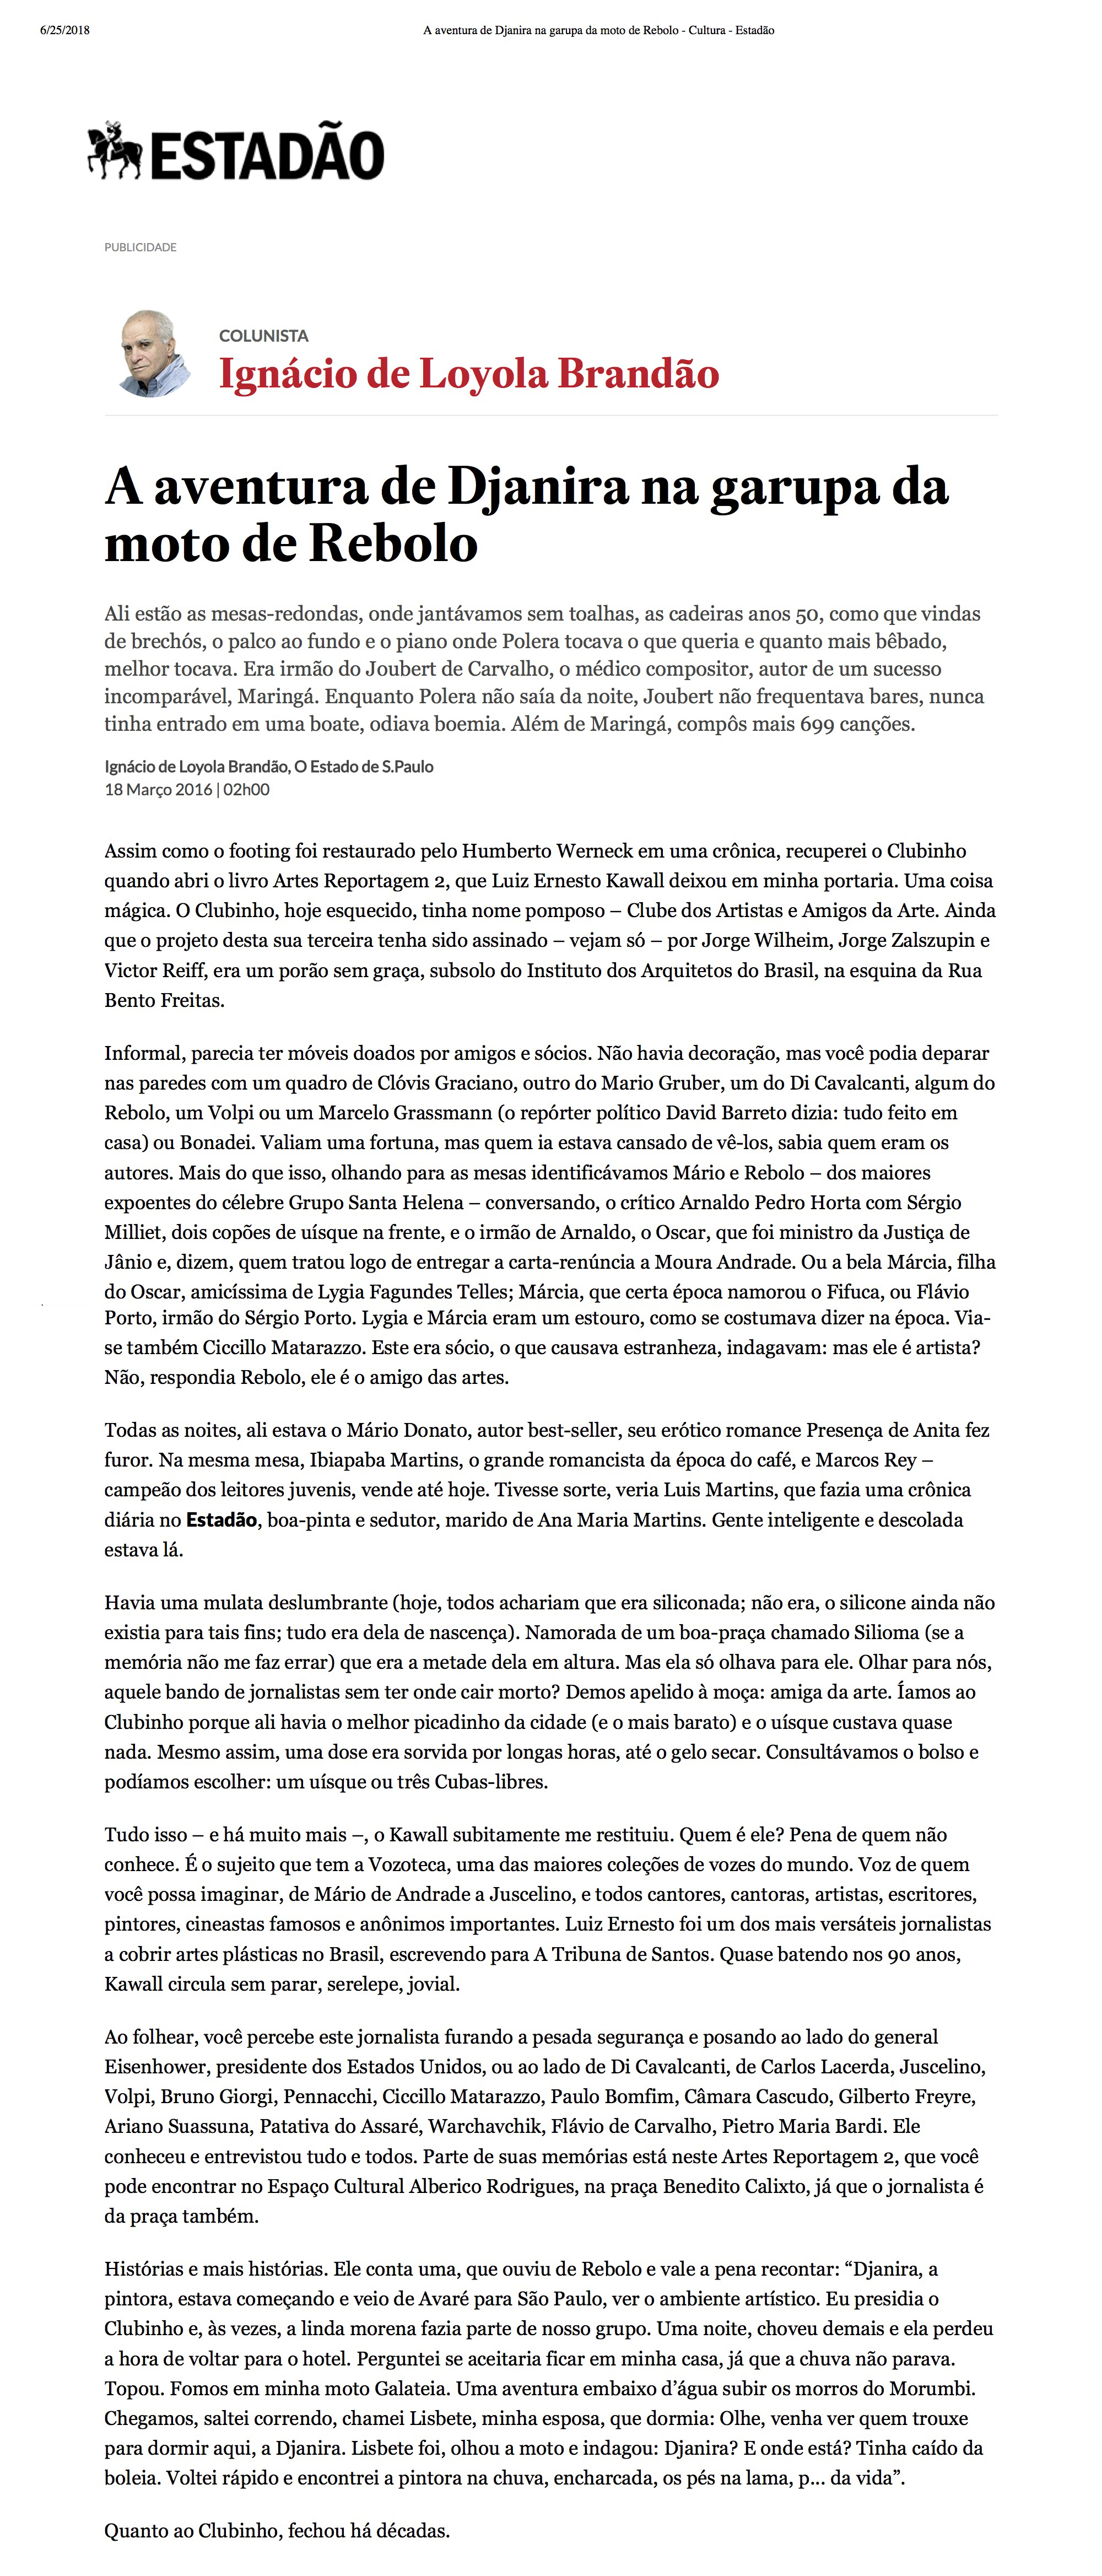 A aventura de Djanira na garupa da moto de Rebolo - Cultura - Estadão.jpg